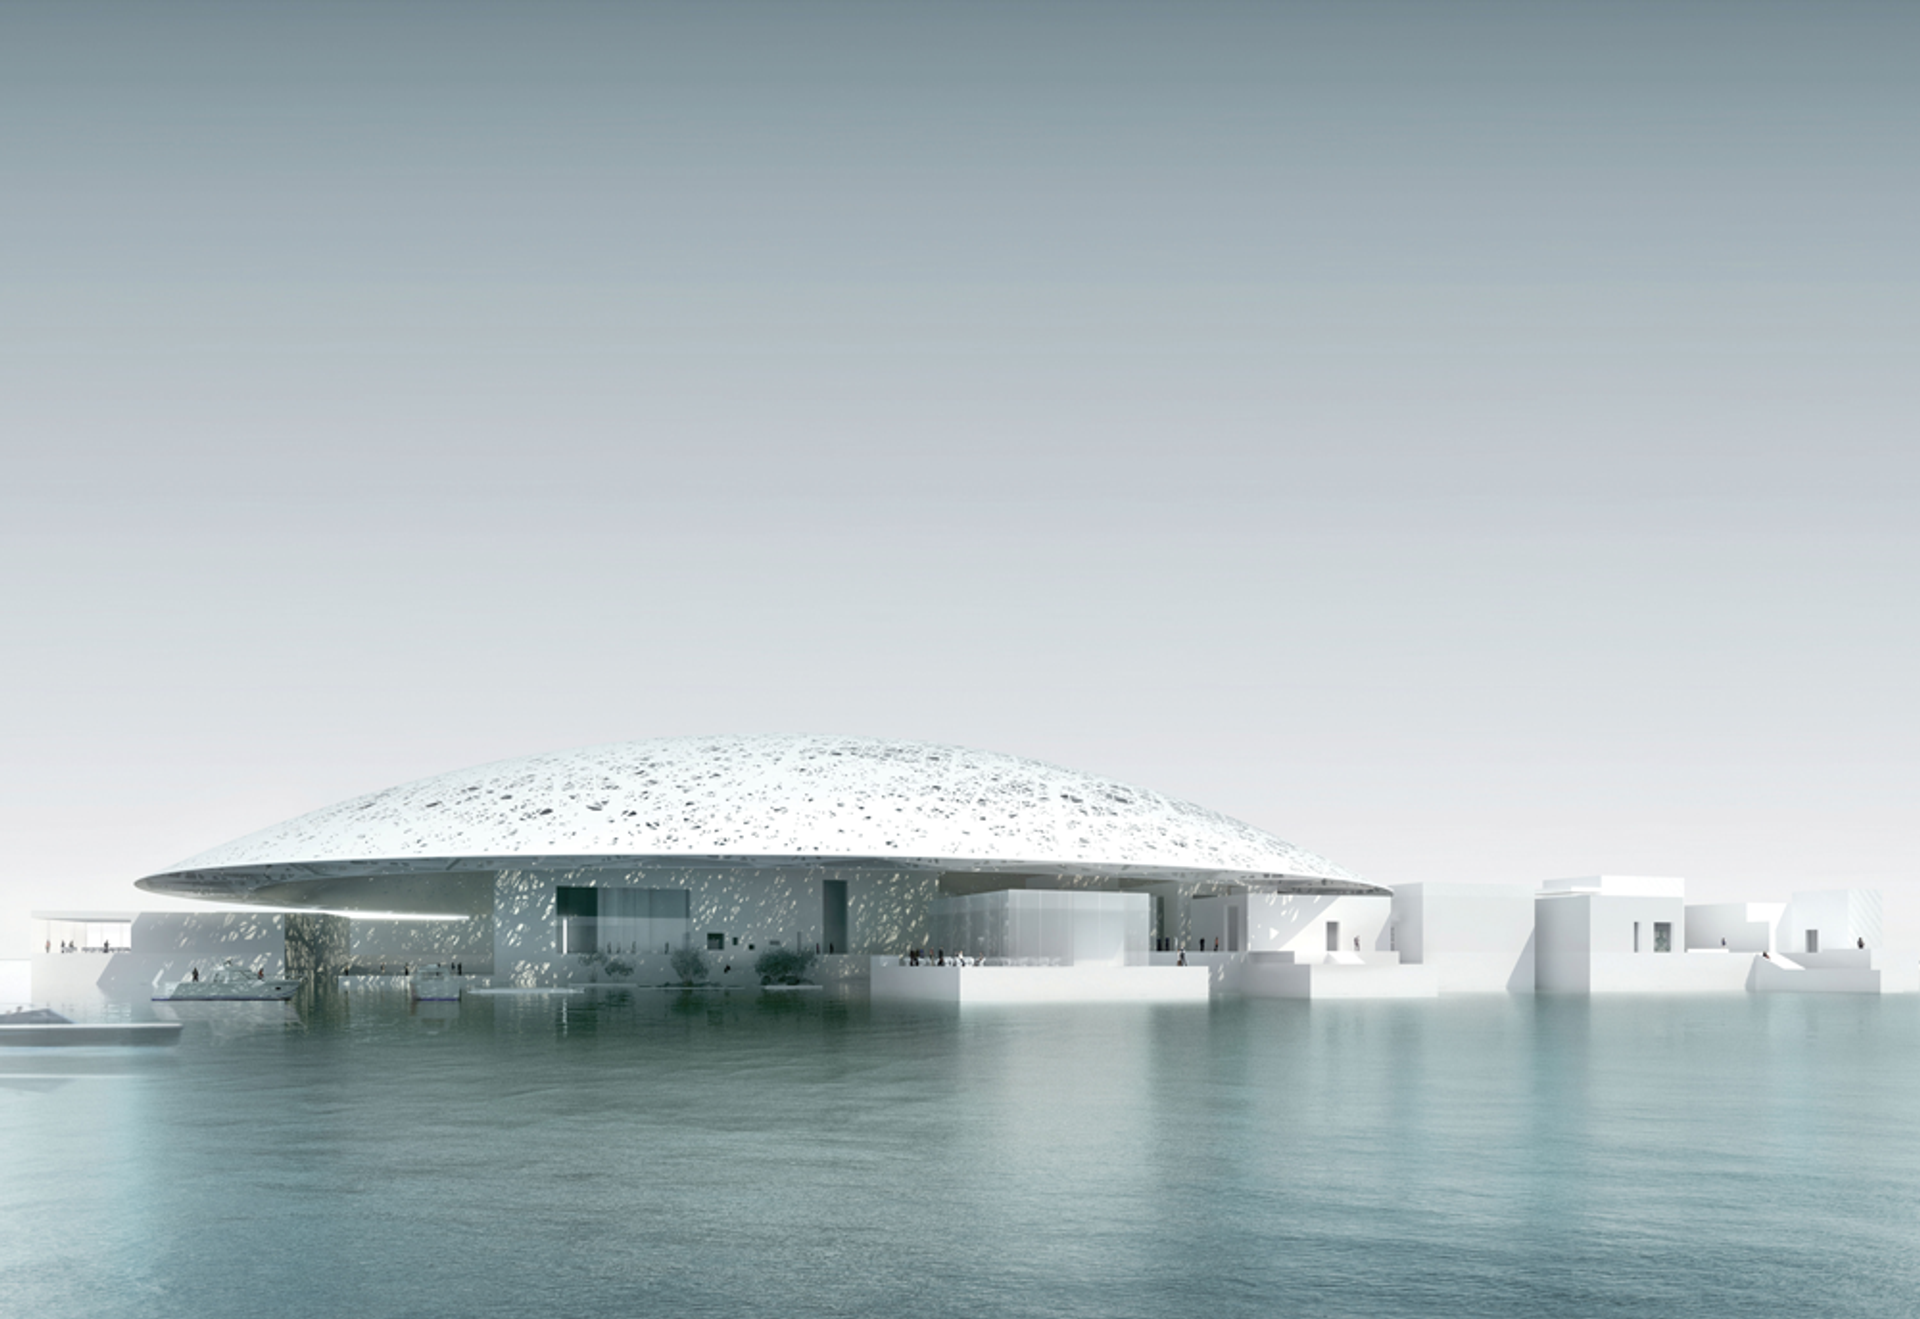 TDIC, Architect Ateliers Jean Nouvel